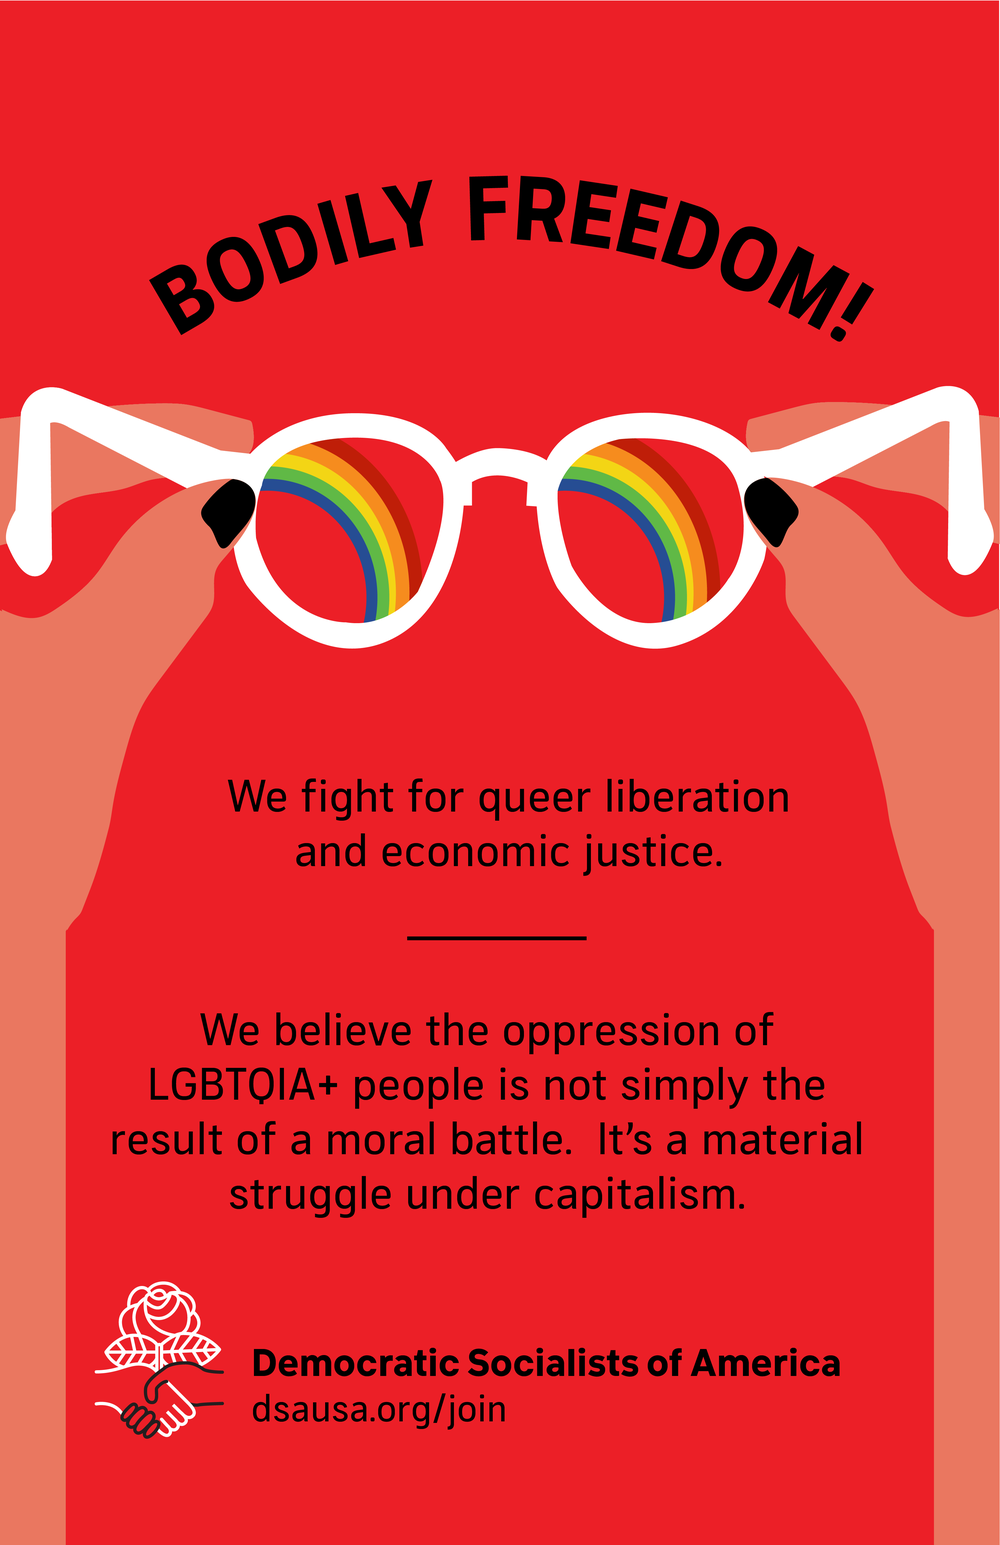 Pasori_Poster_BodilyFreedom_Pride-01.png